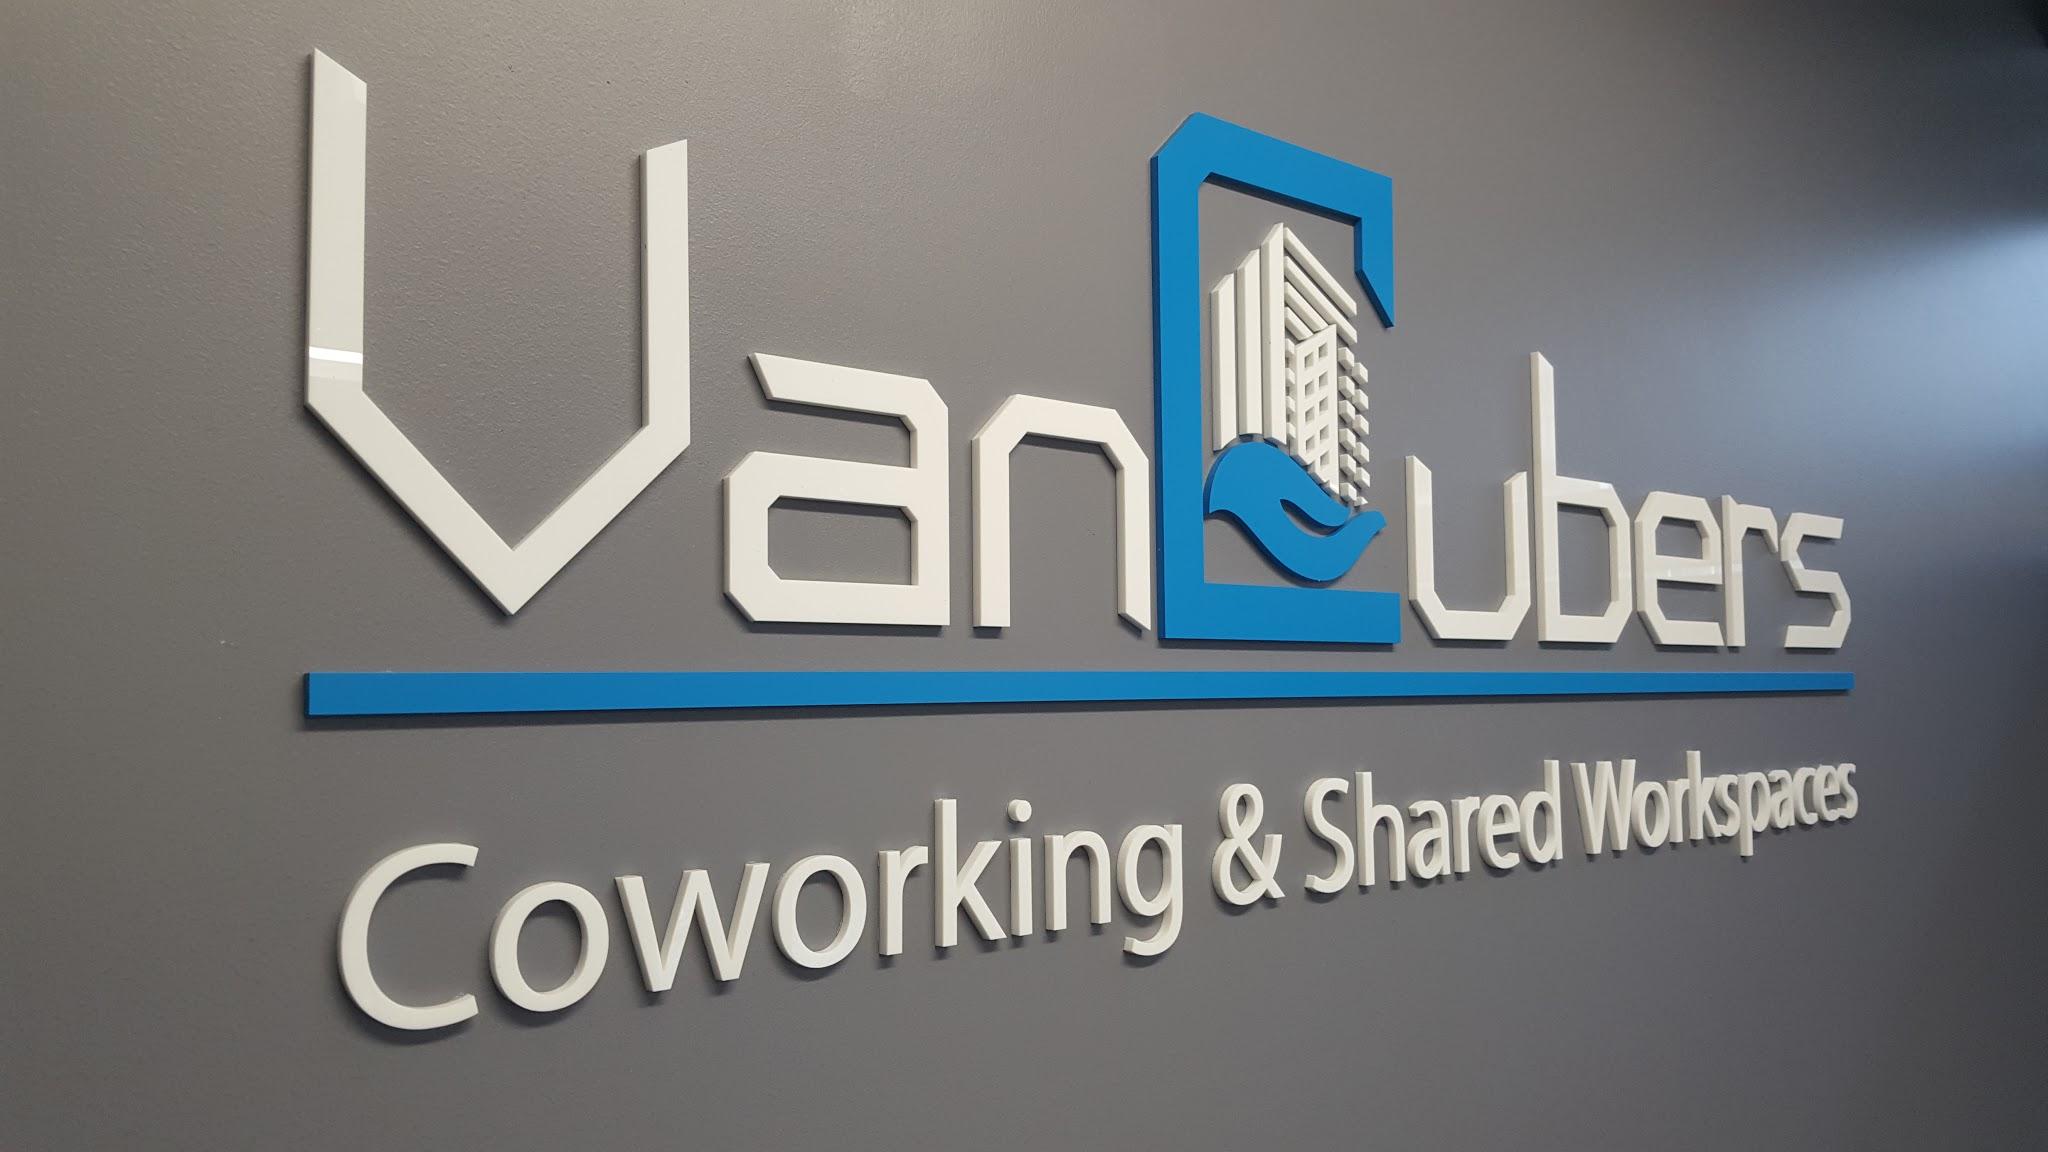 VanCubers, Vancouver